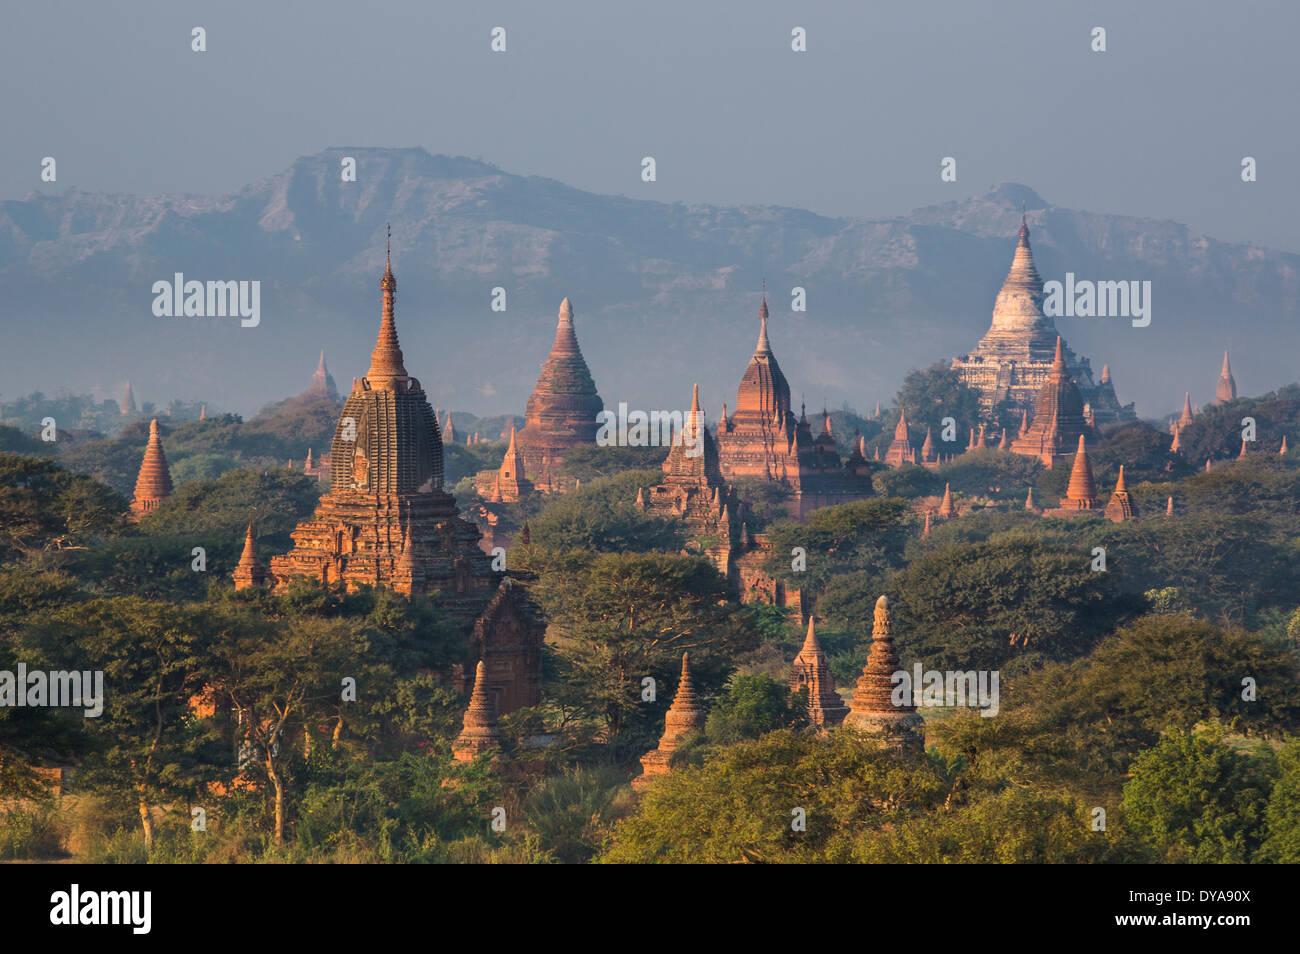 architecture, Bagan, Mandalay, Myanmar, Burma, Asia, famous, history, skyline, temple, tourism, touristic, travel Stock Photo